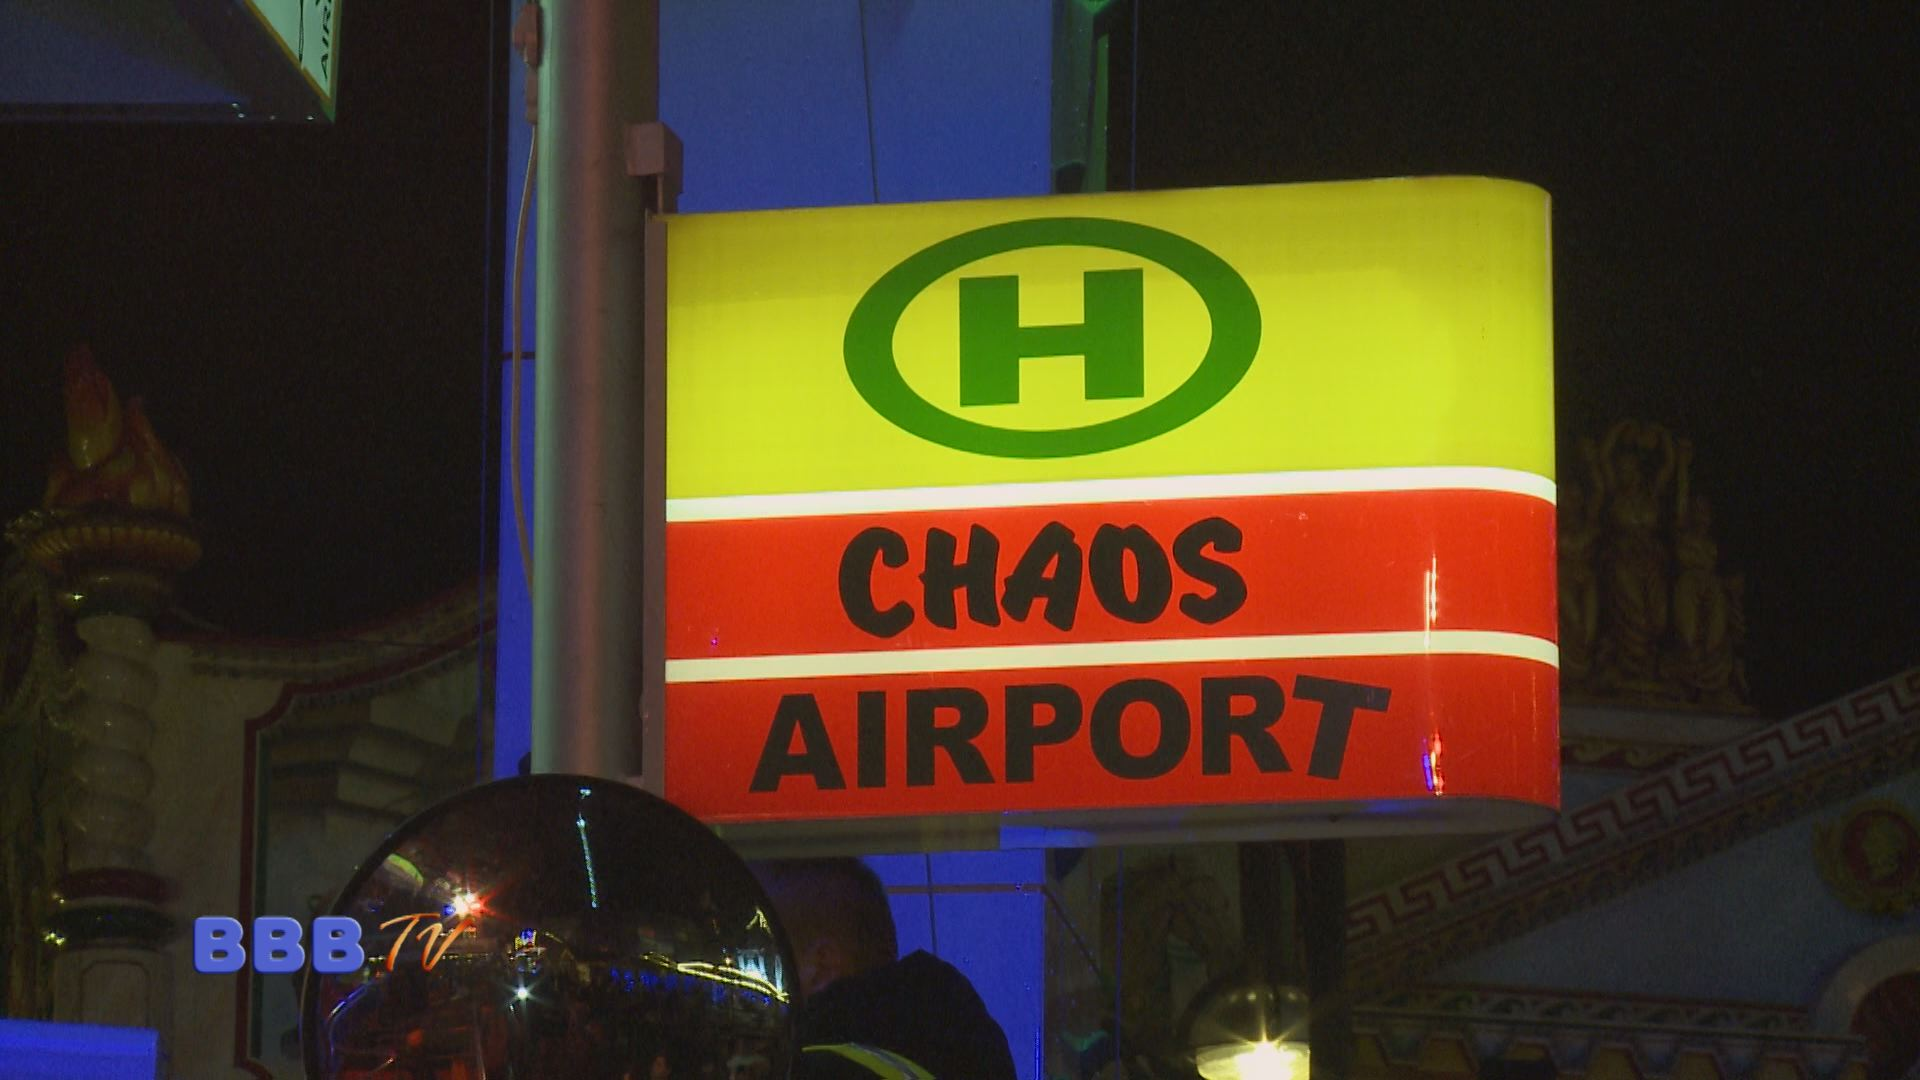 Chaos Airport-Original und Kopie, BBB TV 11.12.2014